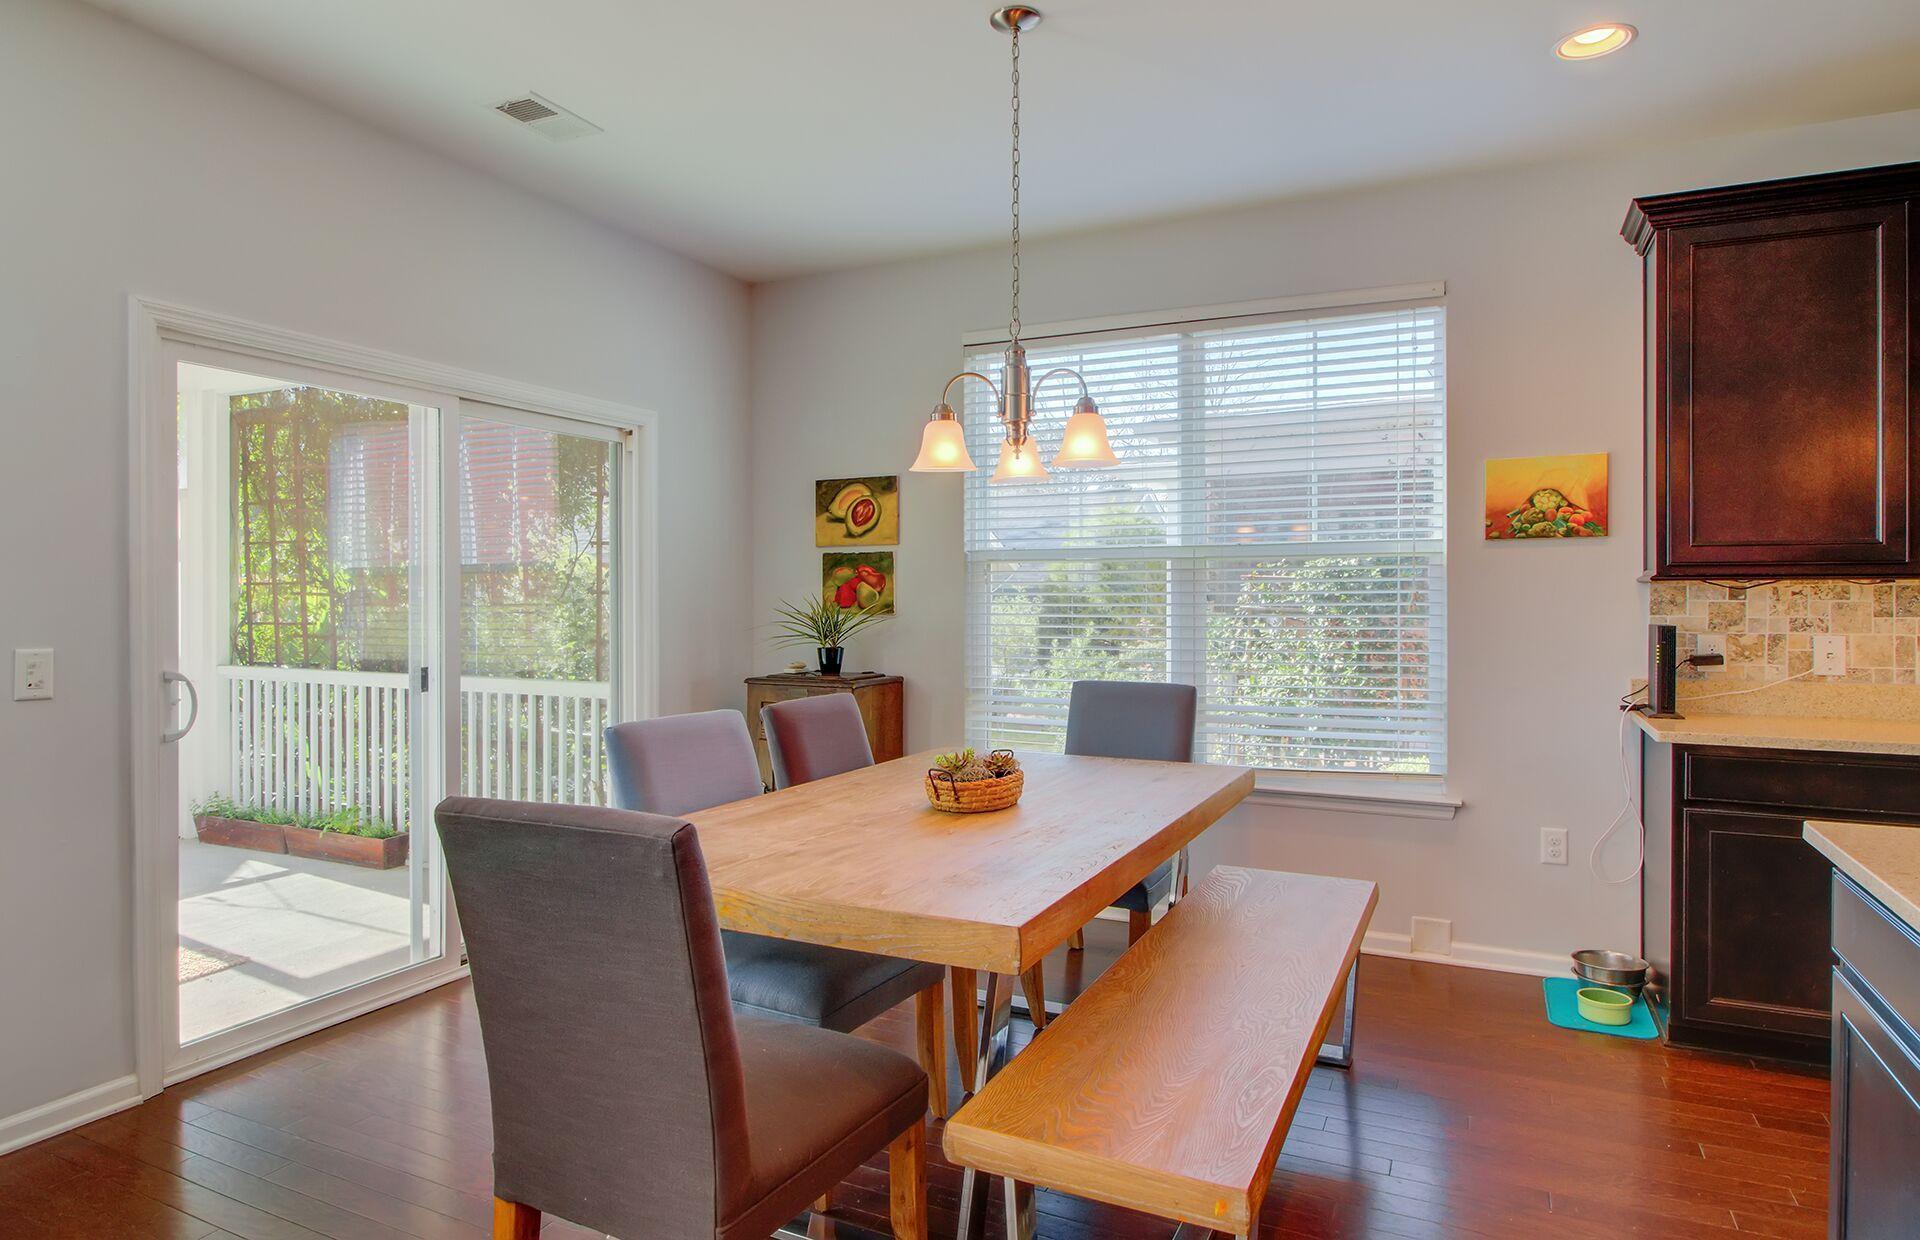 Oak Terrace Preserve Homes For Sale - 4967 Liberty Park, North Charleston, SC - 1